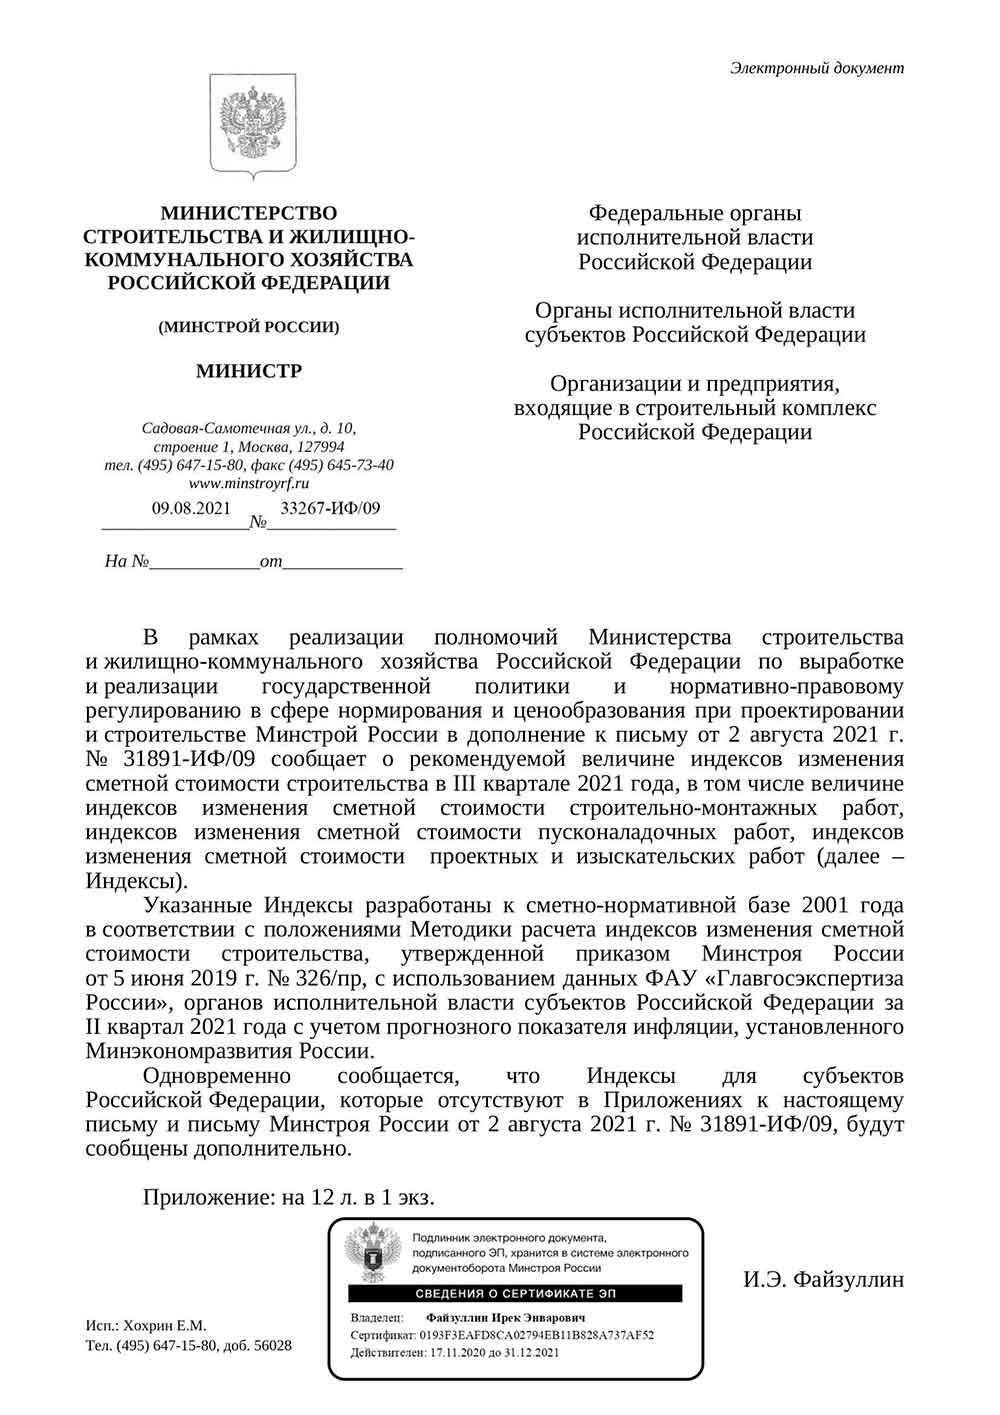 Письмо Минстроя РФ №33267-ИФ/09 от 09.08.2021 г.